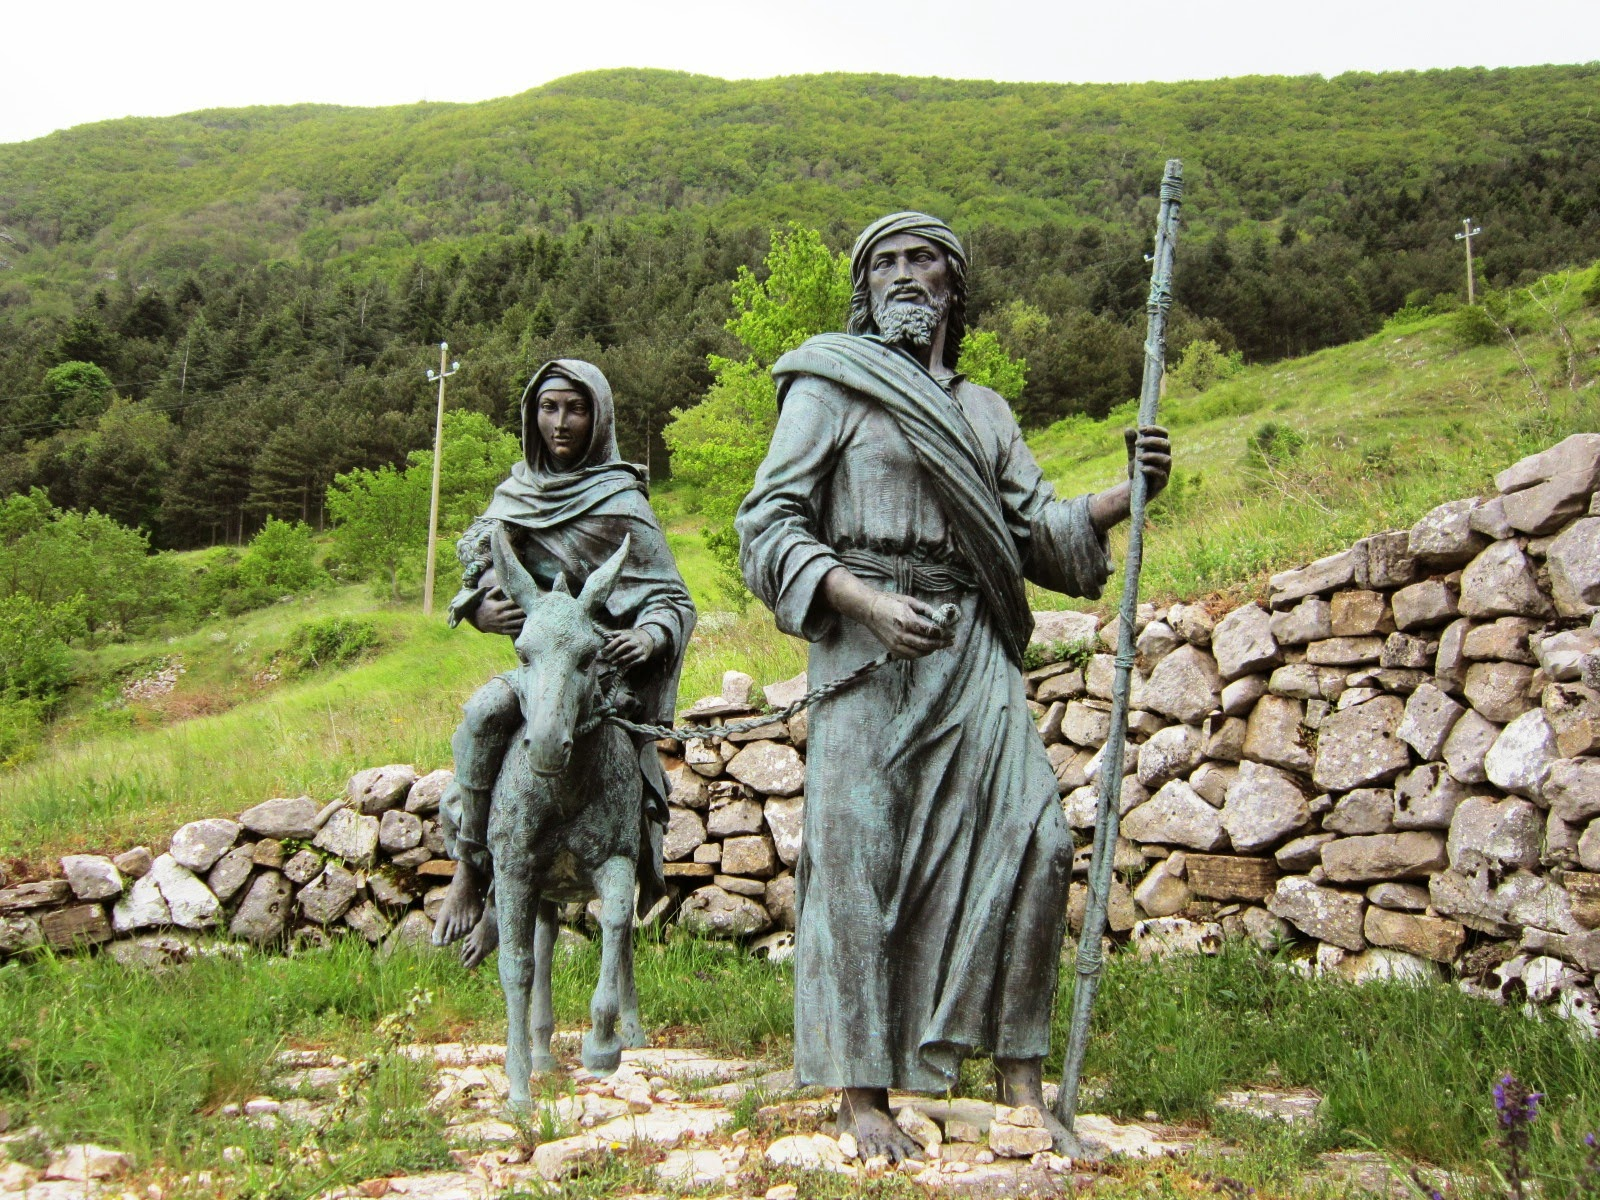 Madre Dolorosa de Castelpetroso, Aparición que Presenció el Obispo, Italia (15 sep, 22 mar)